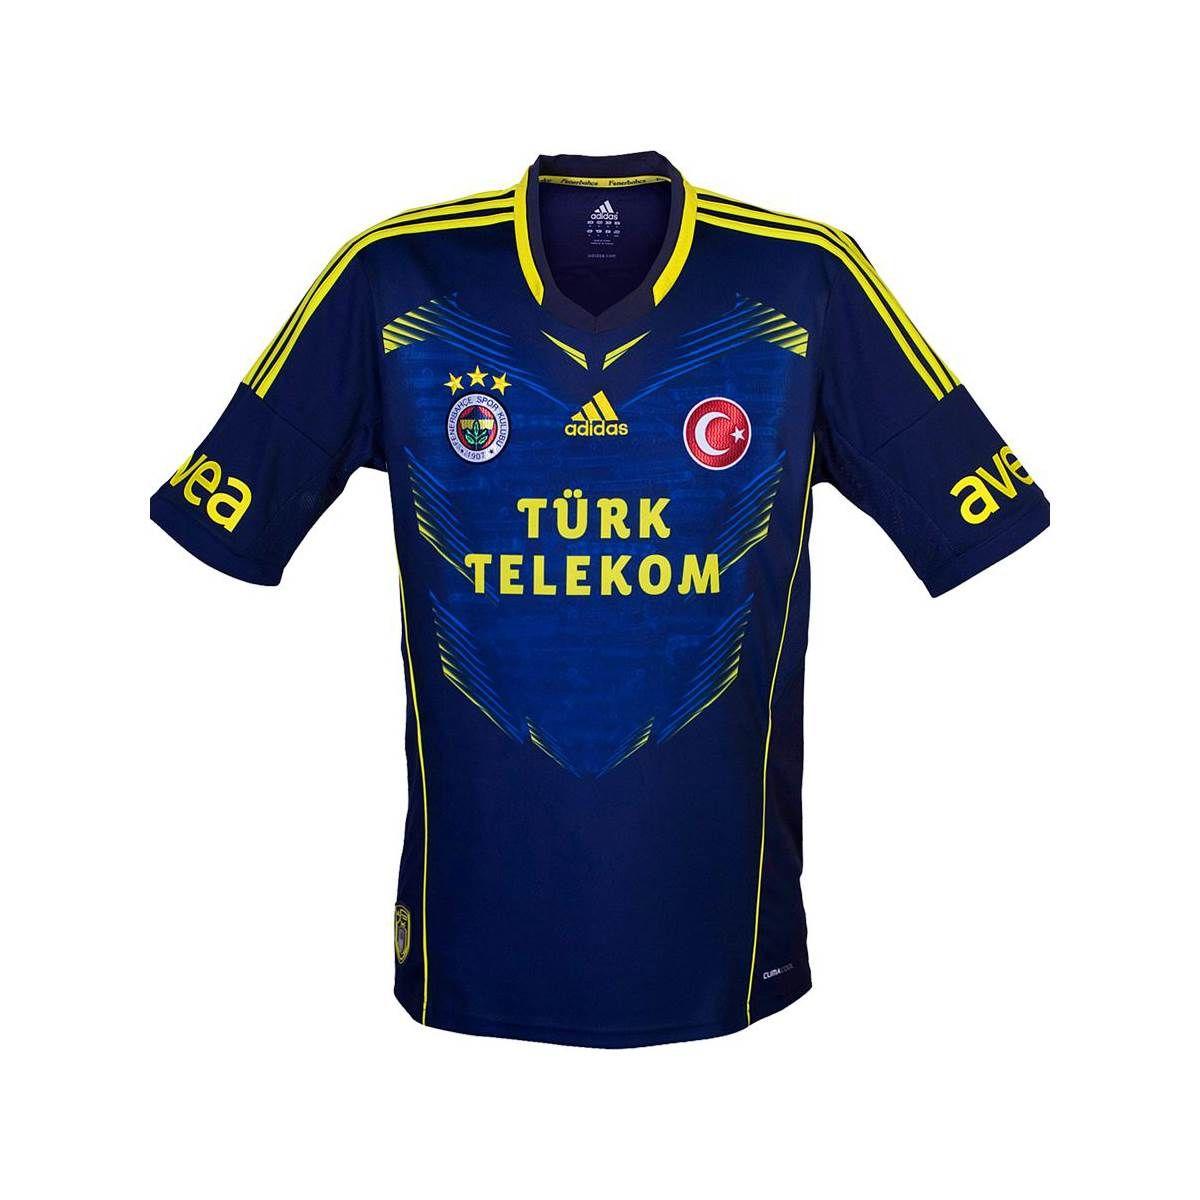 adidas D08133 Fenerbahçe Erkek Taraftar Forması - 1  89abd796eaae9